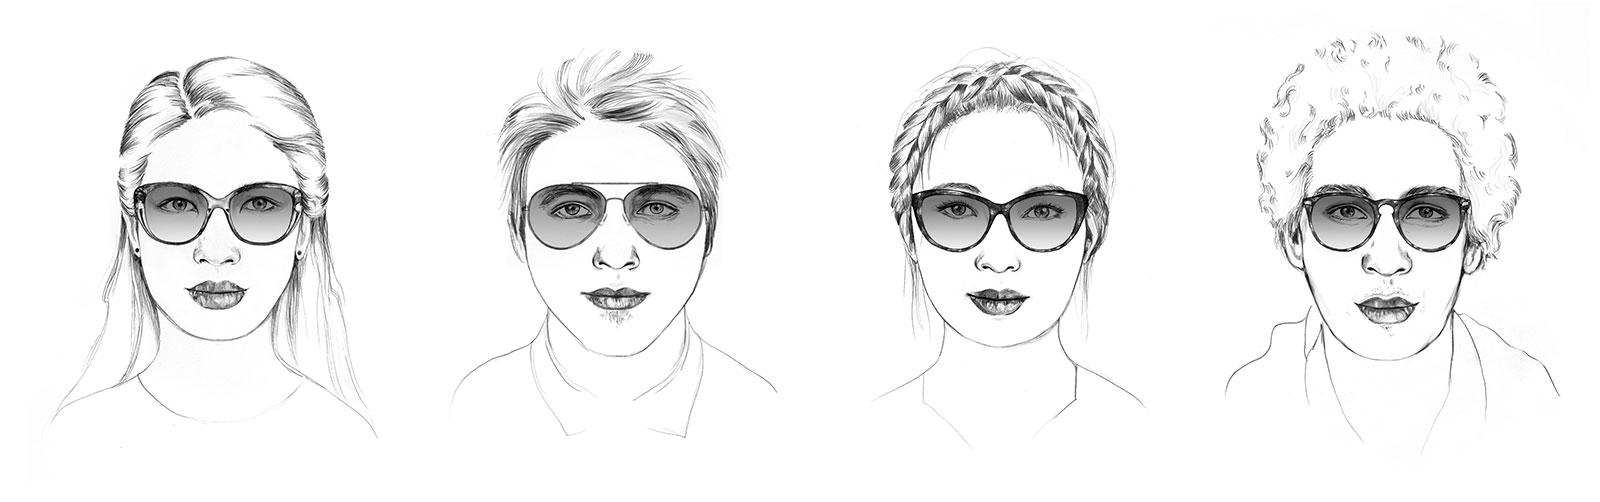 bec_kilpatrick_illustration_sunglasses_soleurs2